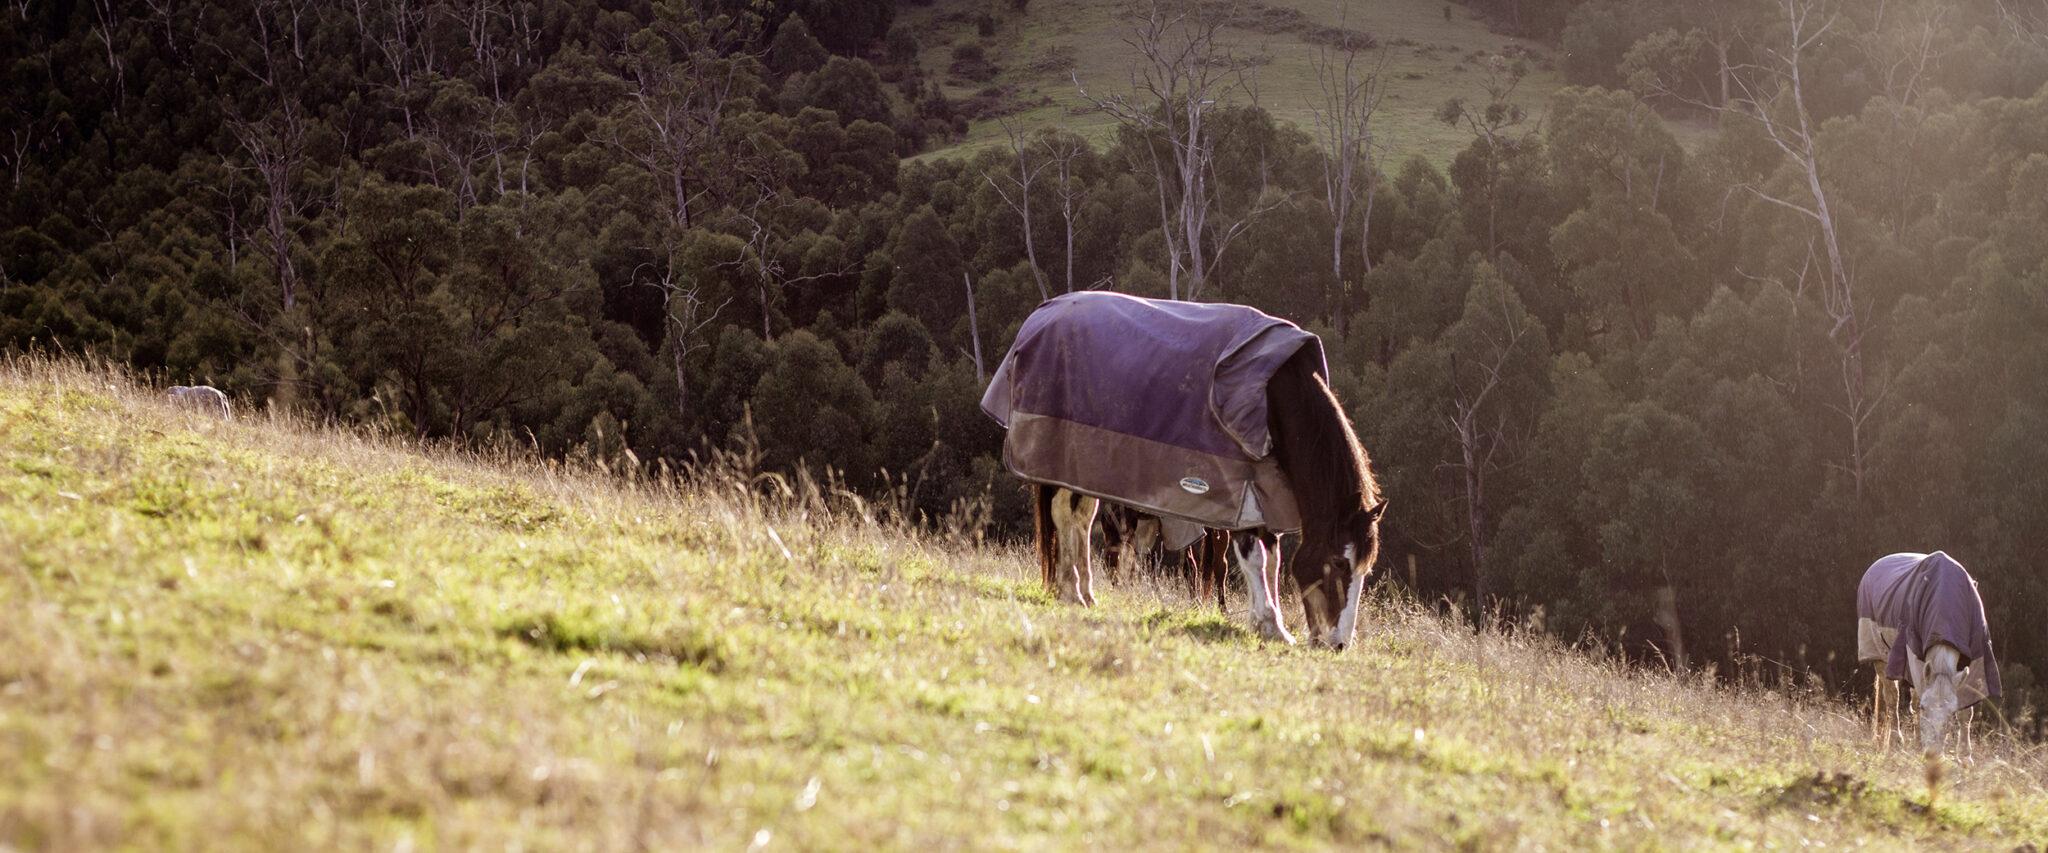 The Yarra Valley Ride, Victoria, Australia - Globetrotting horse riding holidays